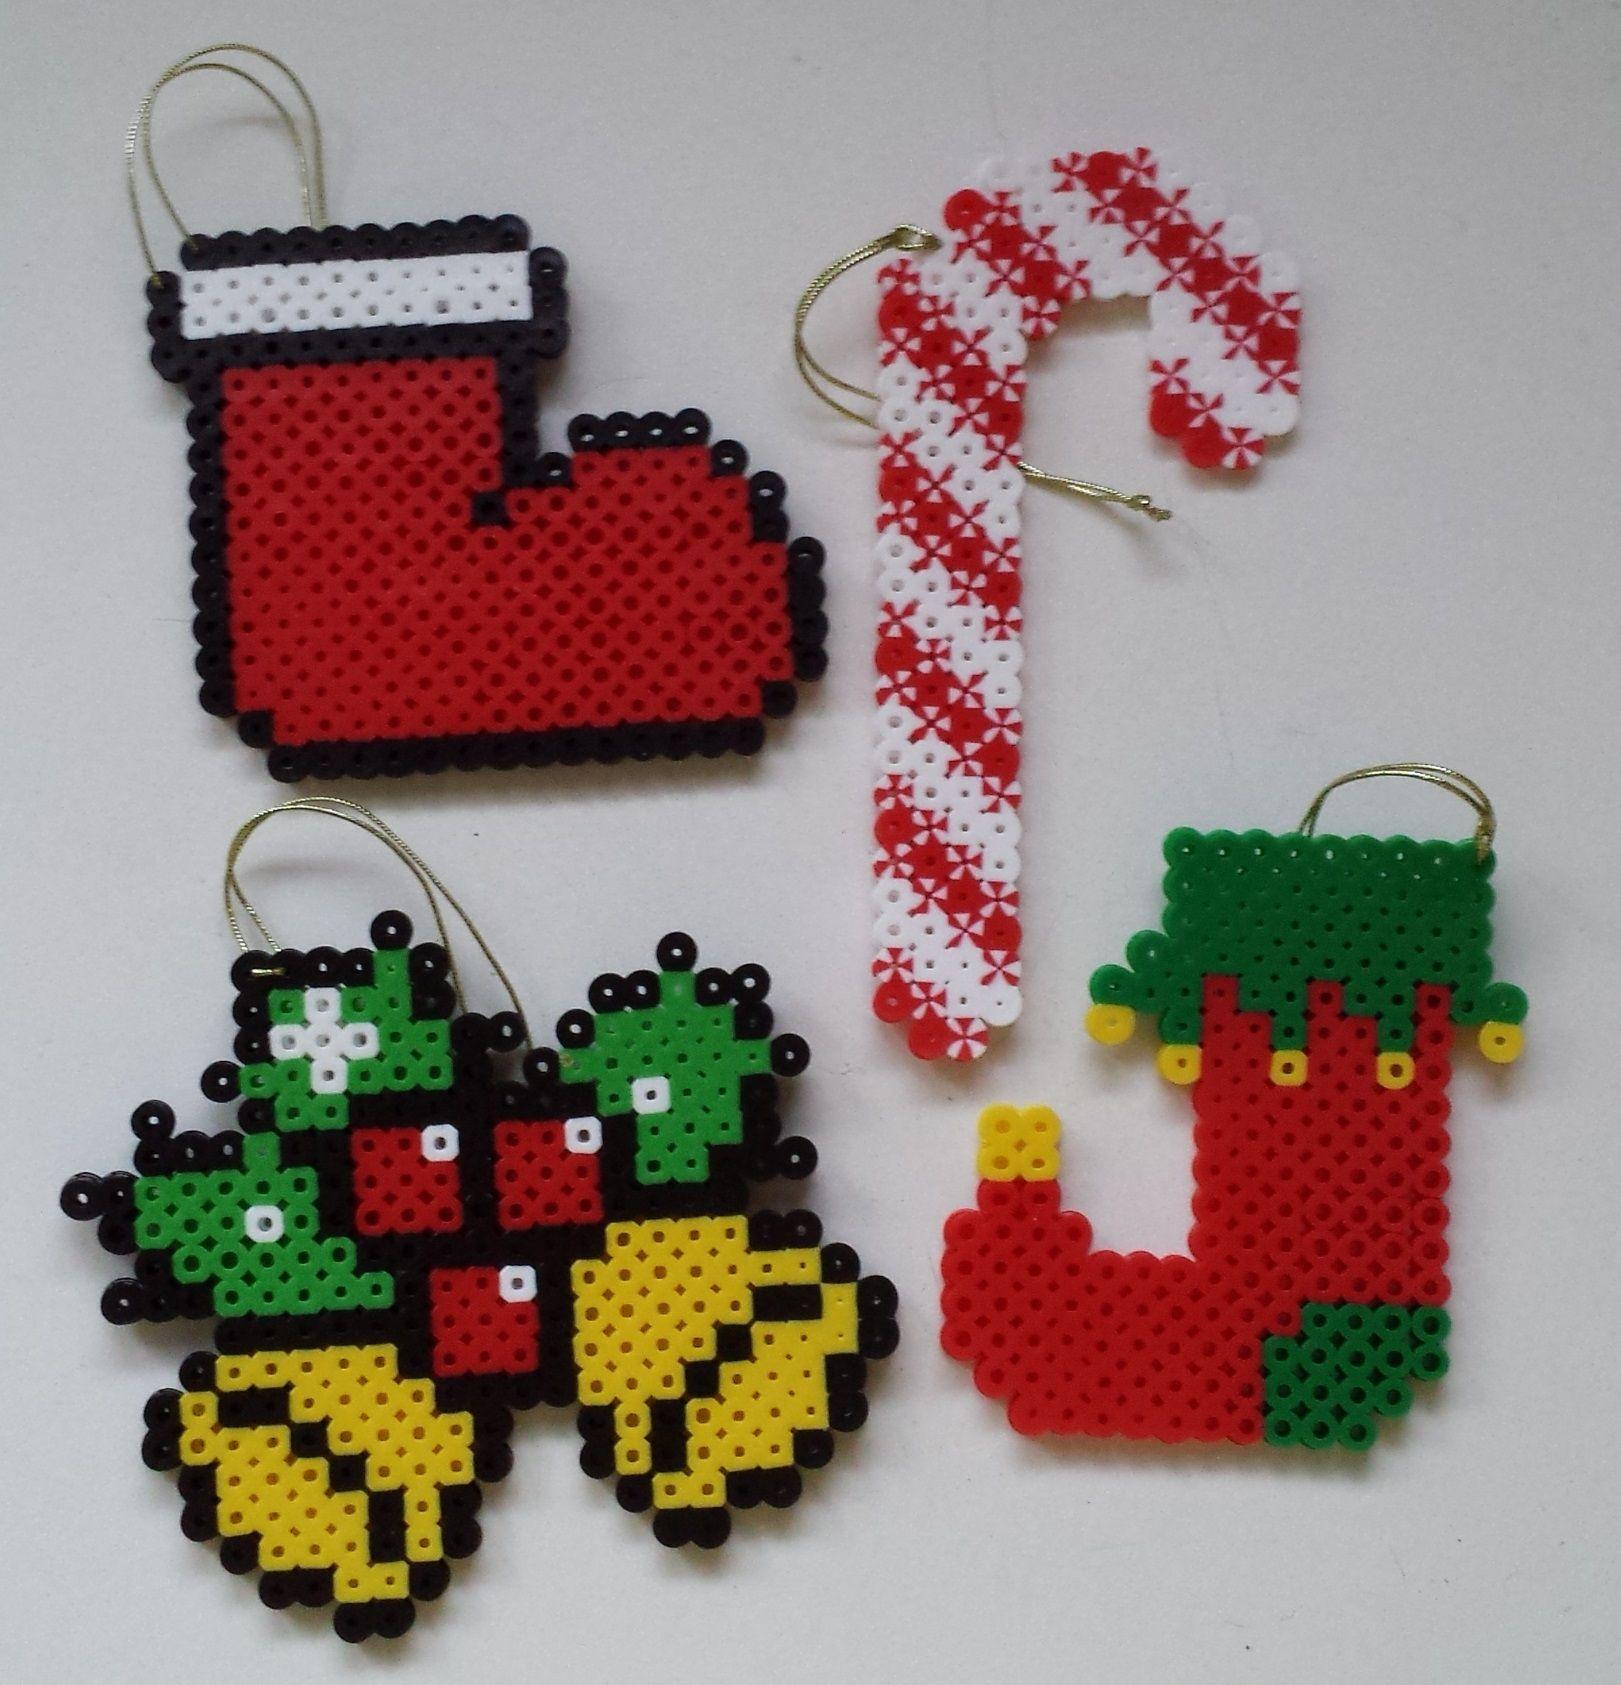 perler bead christmas ornaments by joanne schiavoni - Perler Beads Christmas